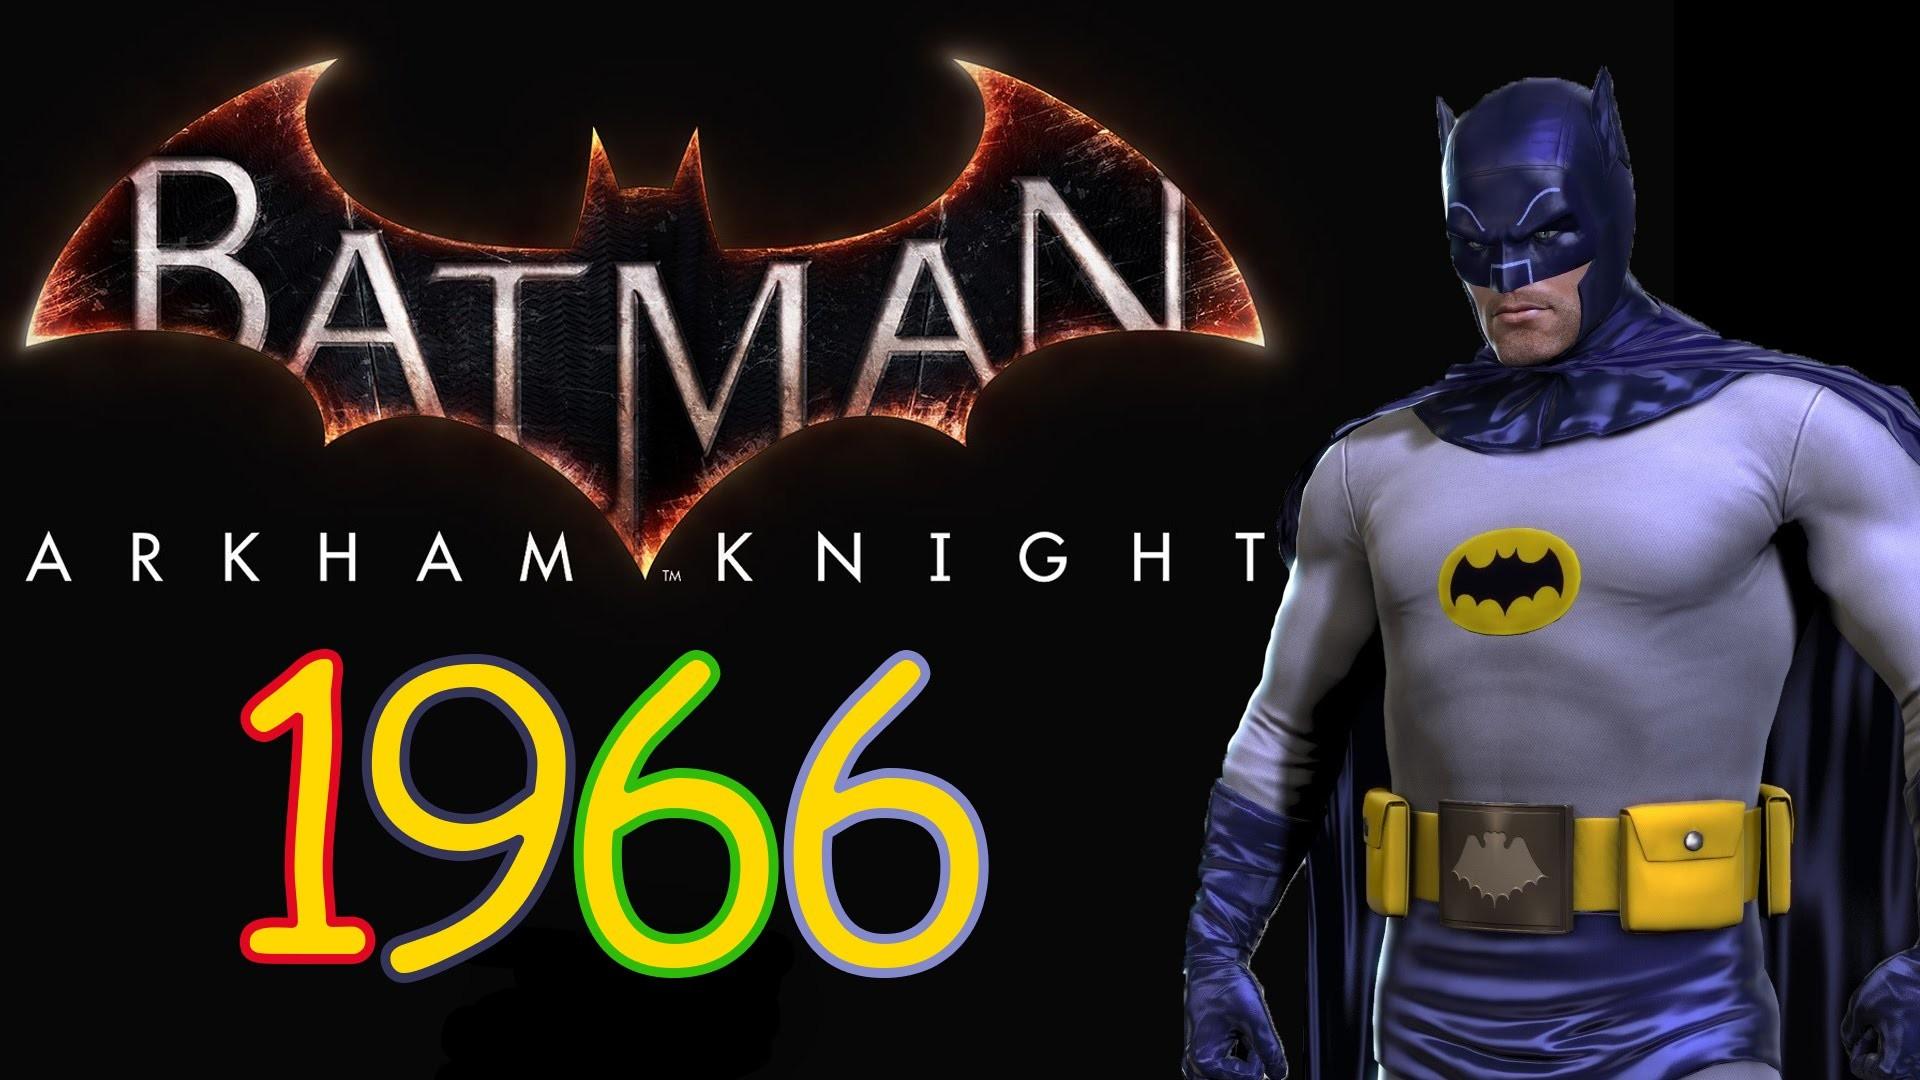 Batman Arkham Knight – 1966